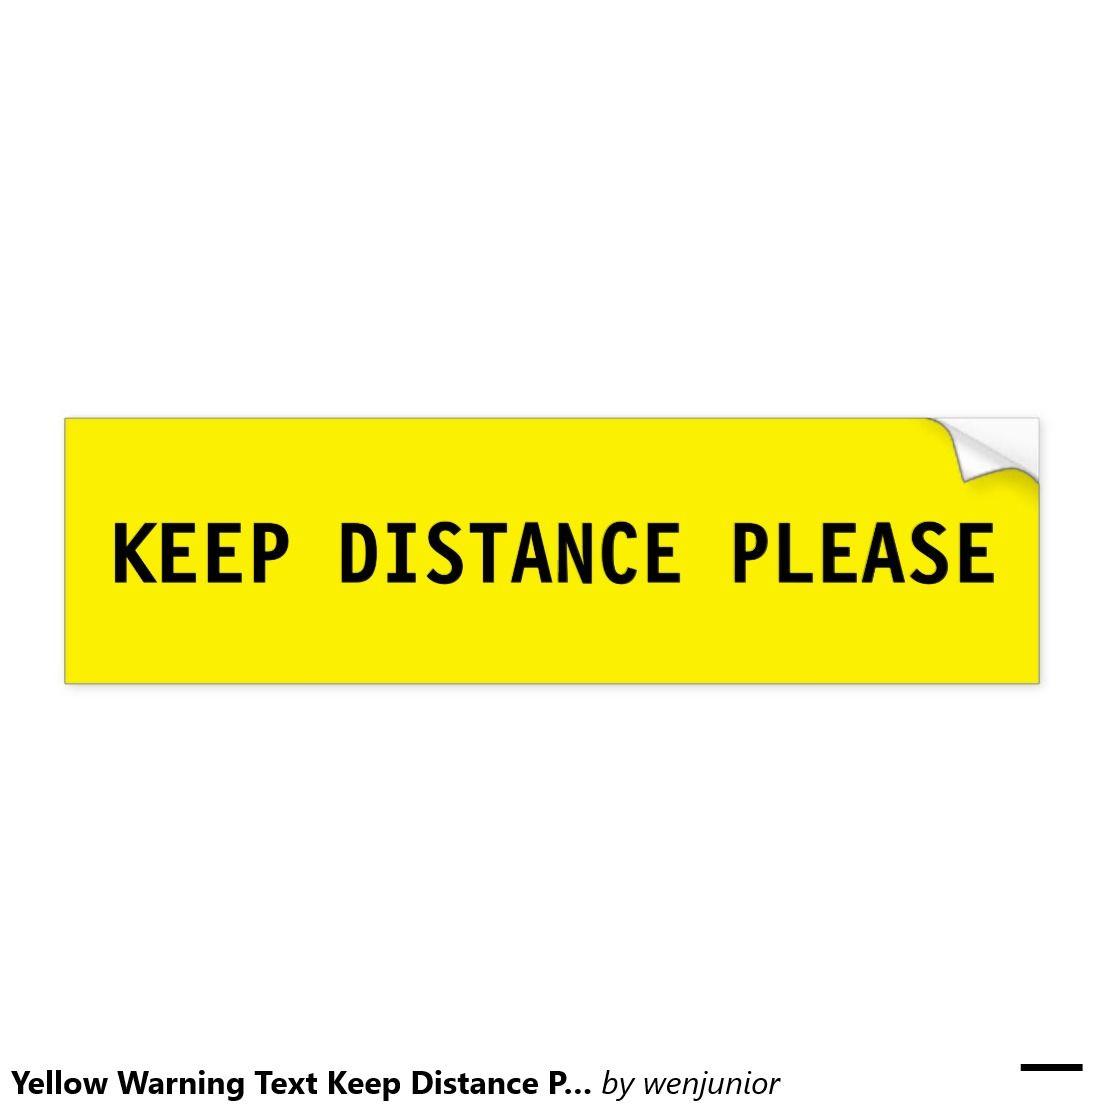 Yellow Warning Text Keep Distance Please Bumper Sticker Zazzle Com In 2021 Car Bumper Stickers Yellow Car Bumper Stickers [ 1104 x 1104 Pixel ]